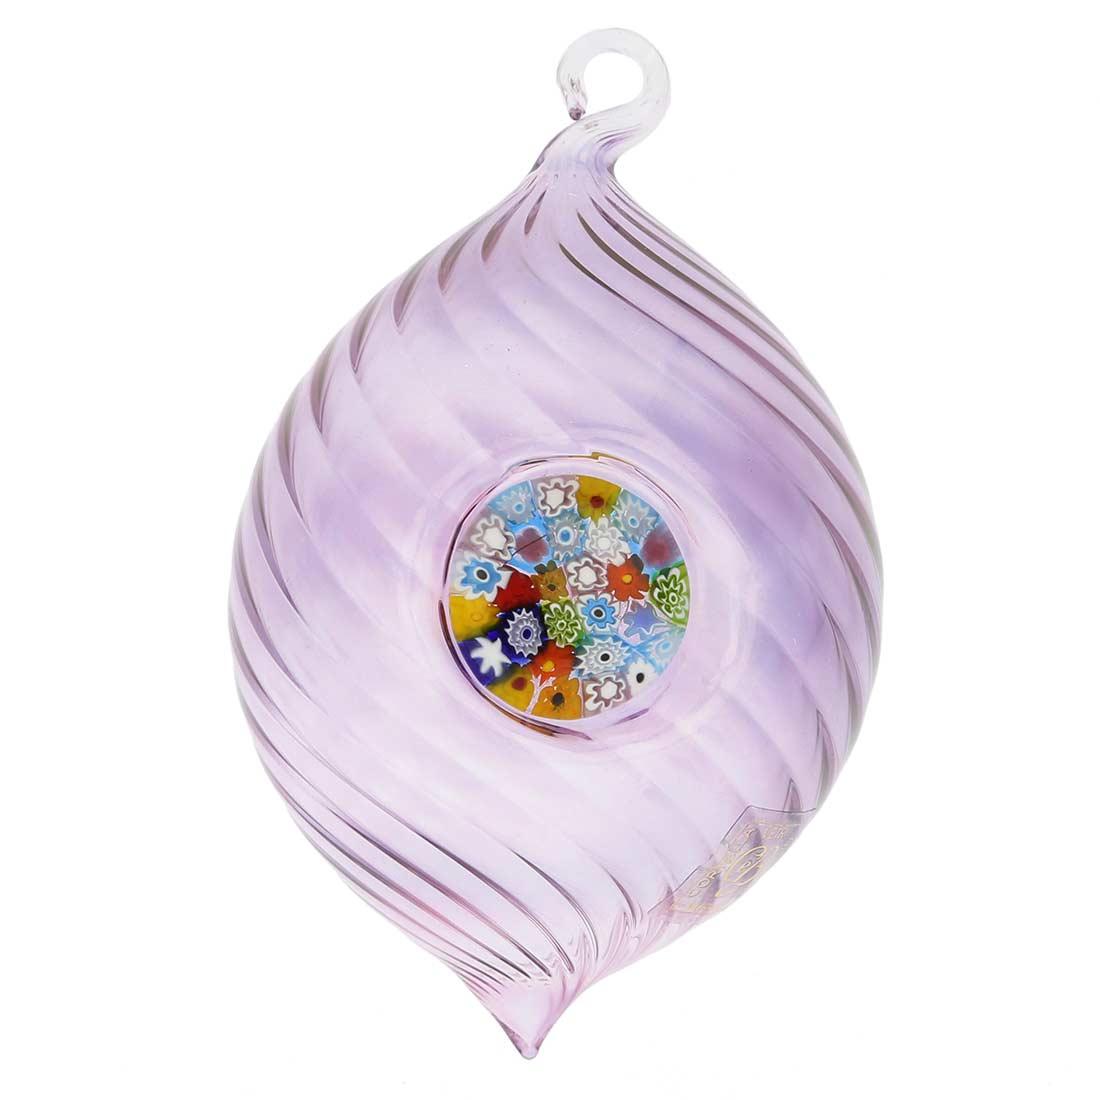 Murano Glass Millefiori Christmas Ornament - Purple